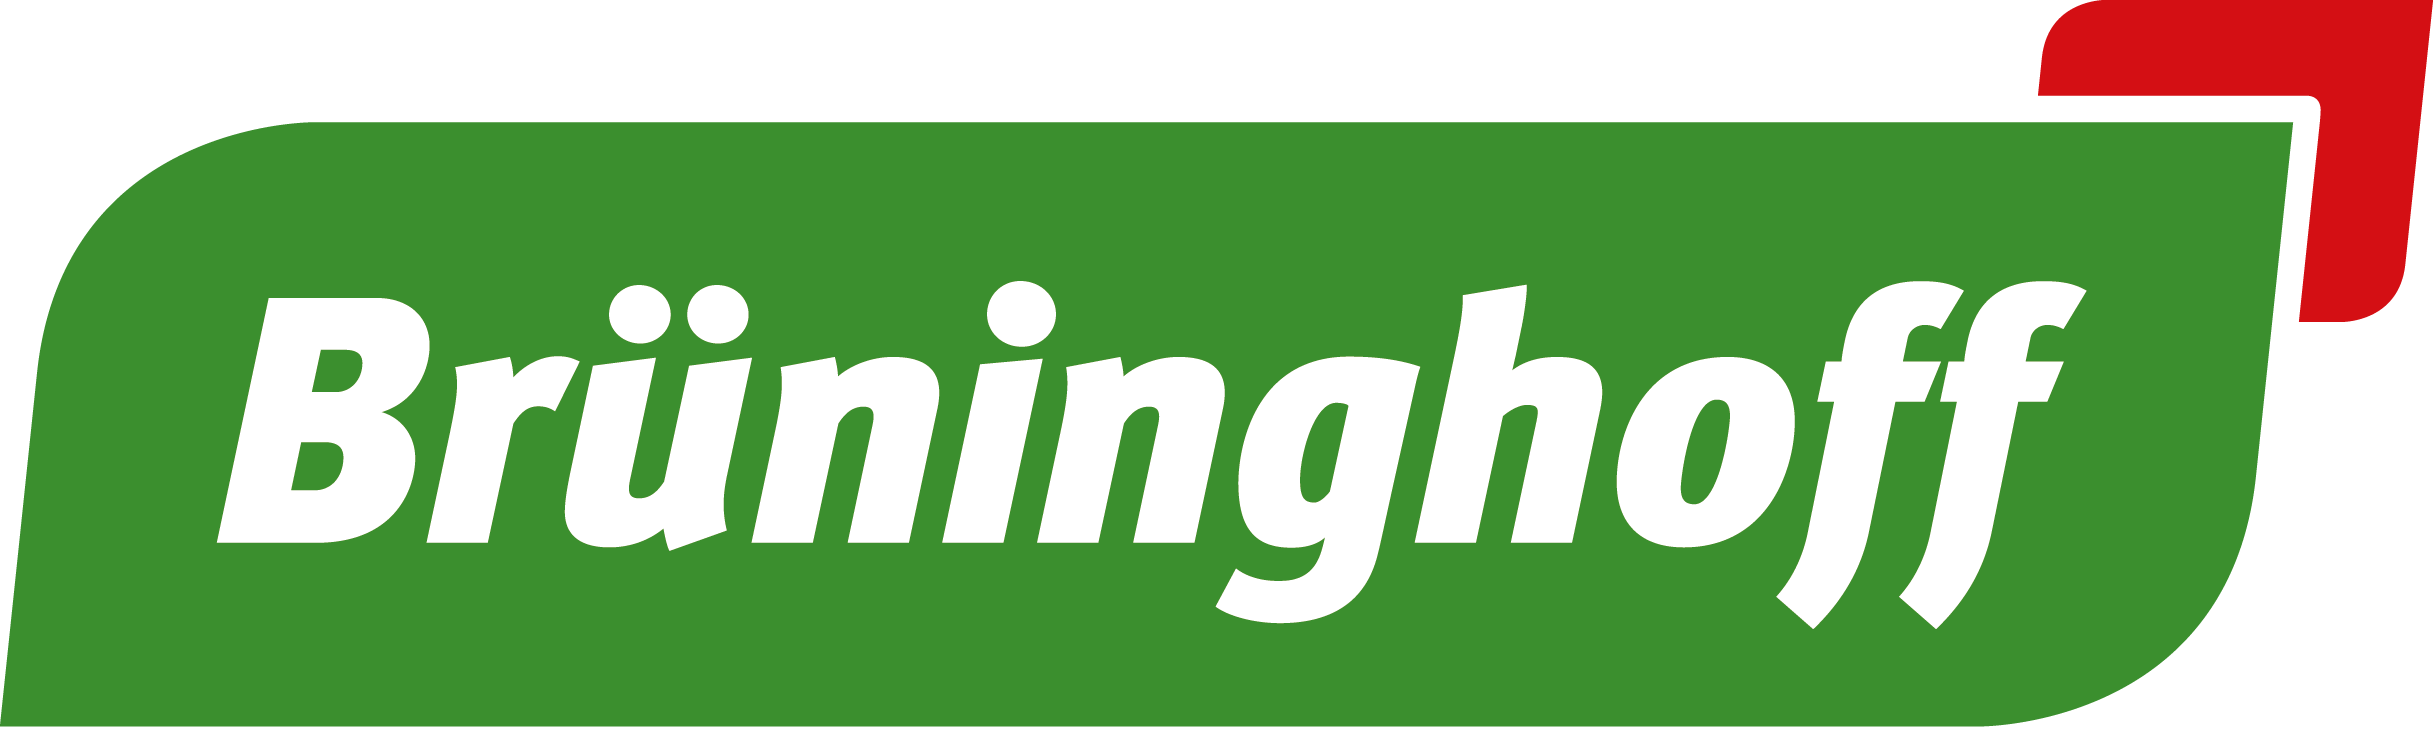 Brüninghoff Kalbfleisch Logo